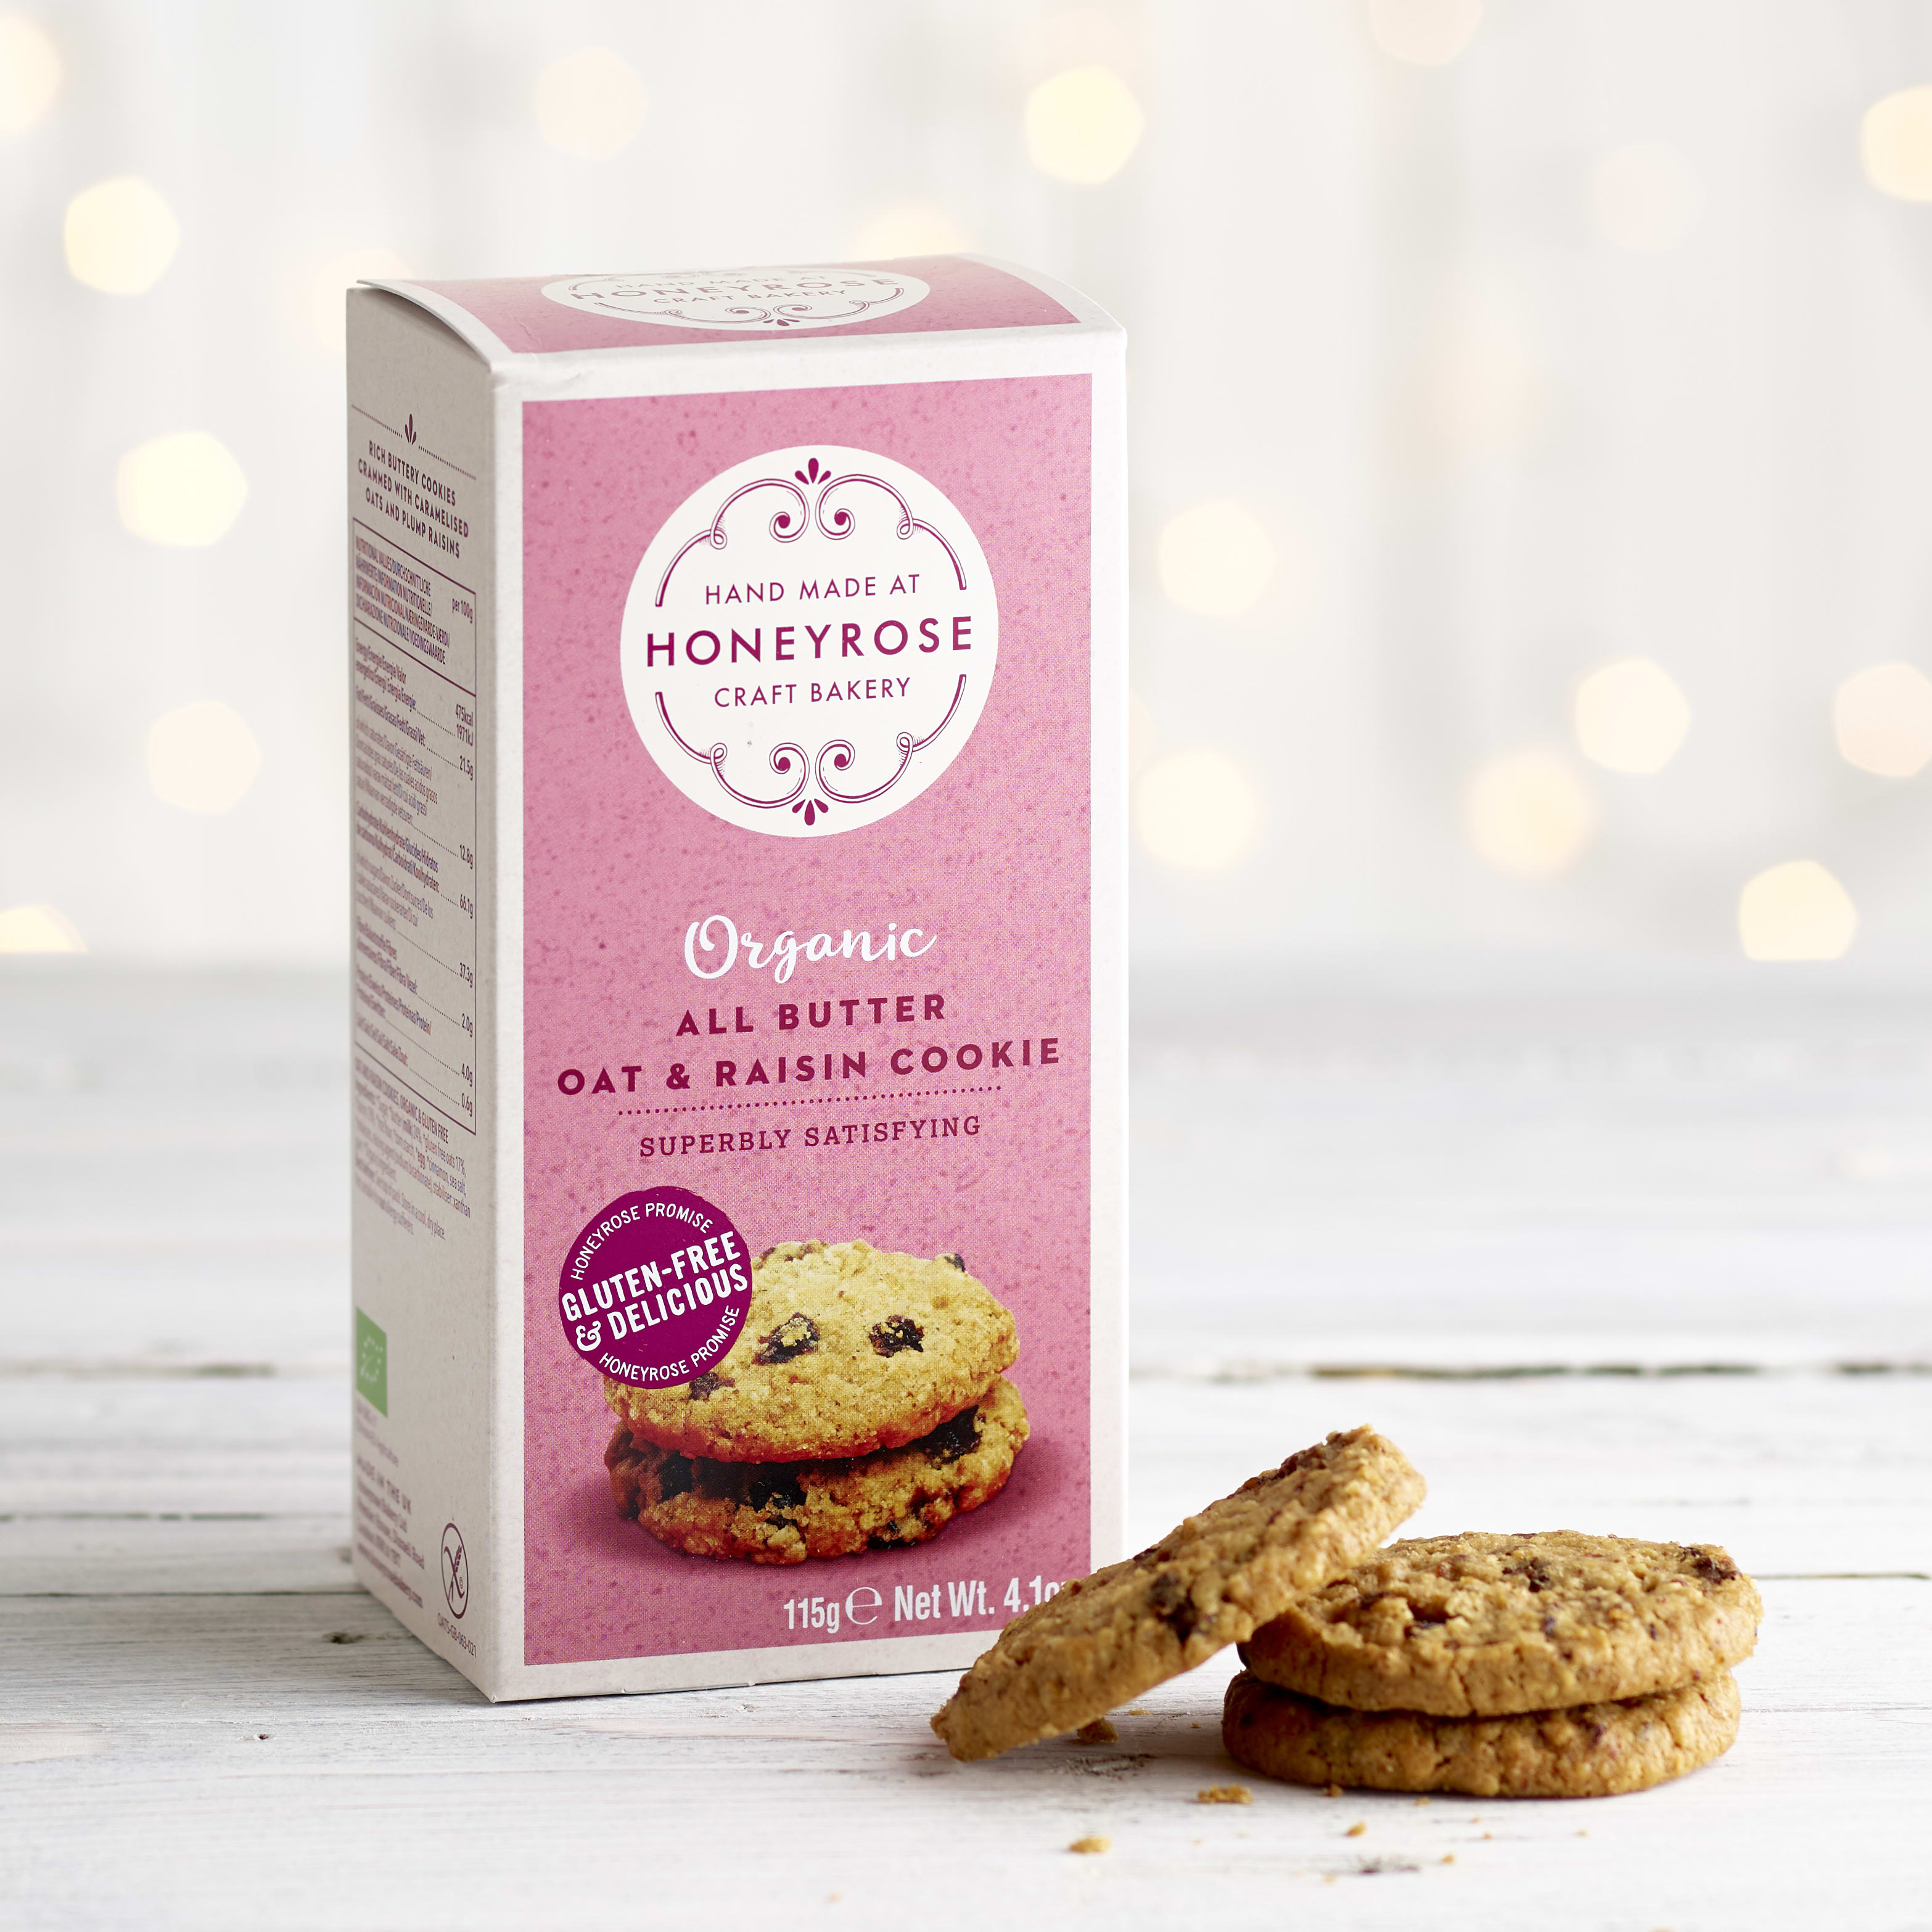 Honeyrose Organic Oat & Raisin Cookies, 115g